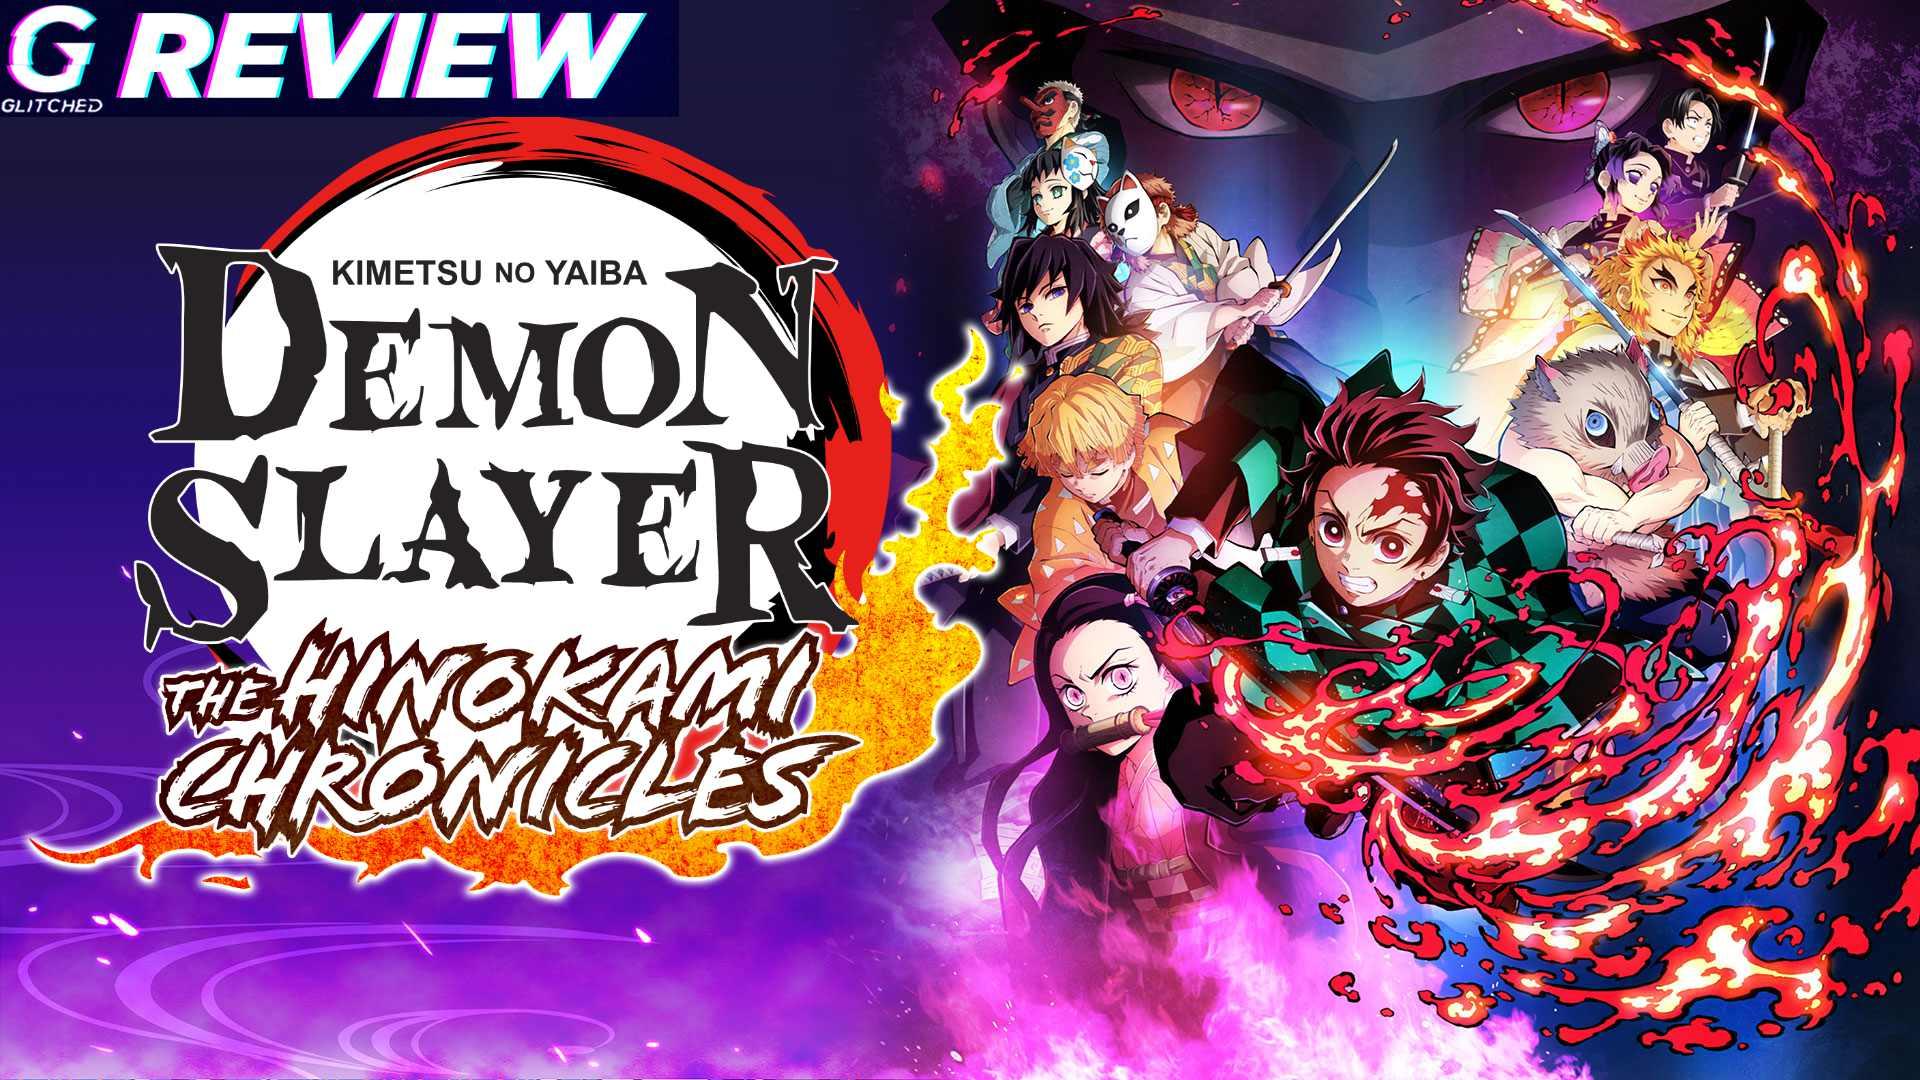 Demon Slayer: The Hinokami Chronicles Review